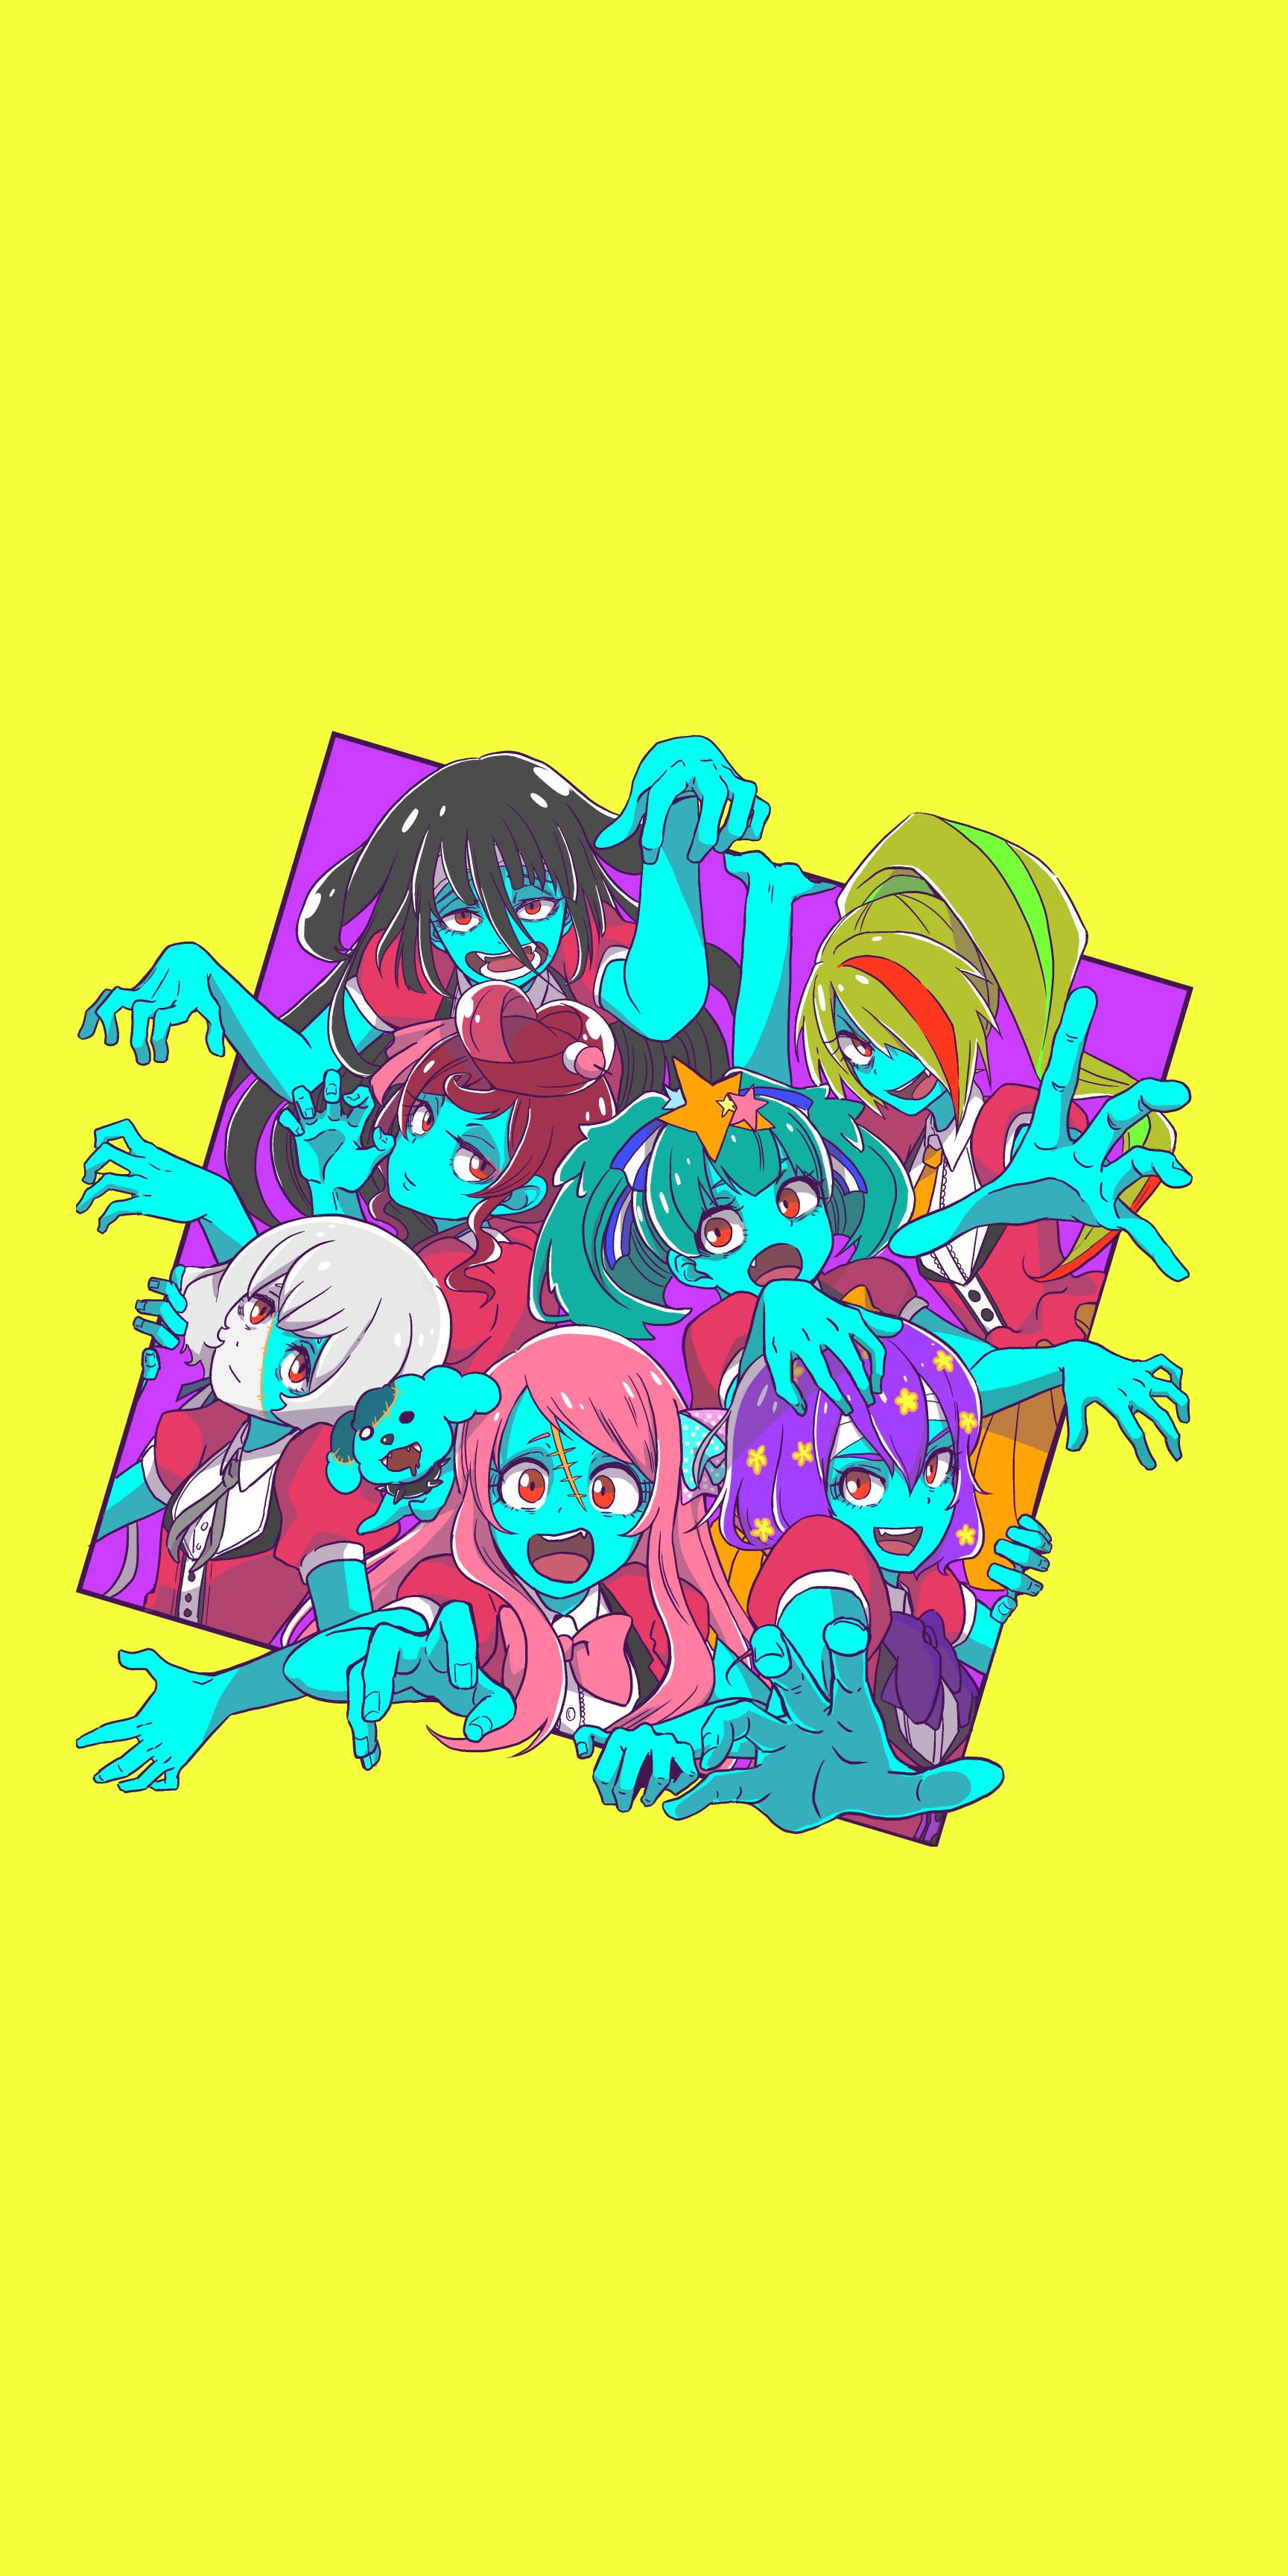 Zombieland Saga 1729x3458 Music Indieartist Chicago Zombieland Zombie Land Saga Saga Art